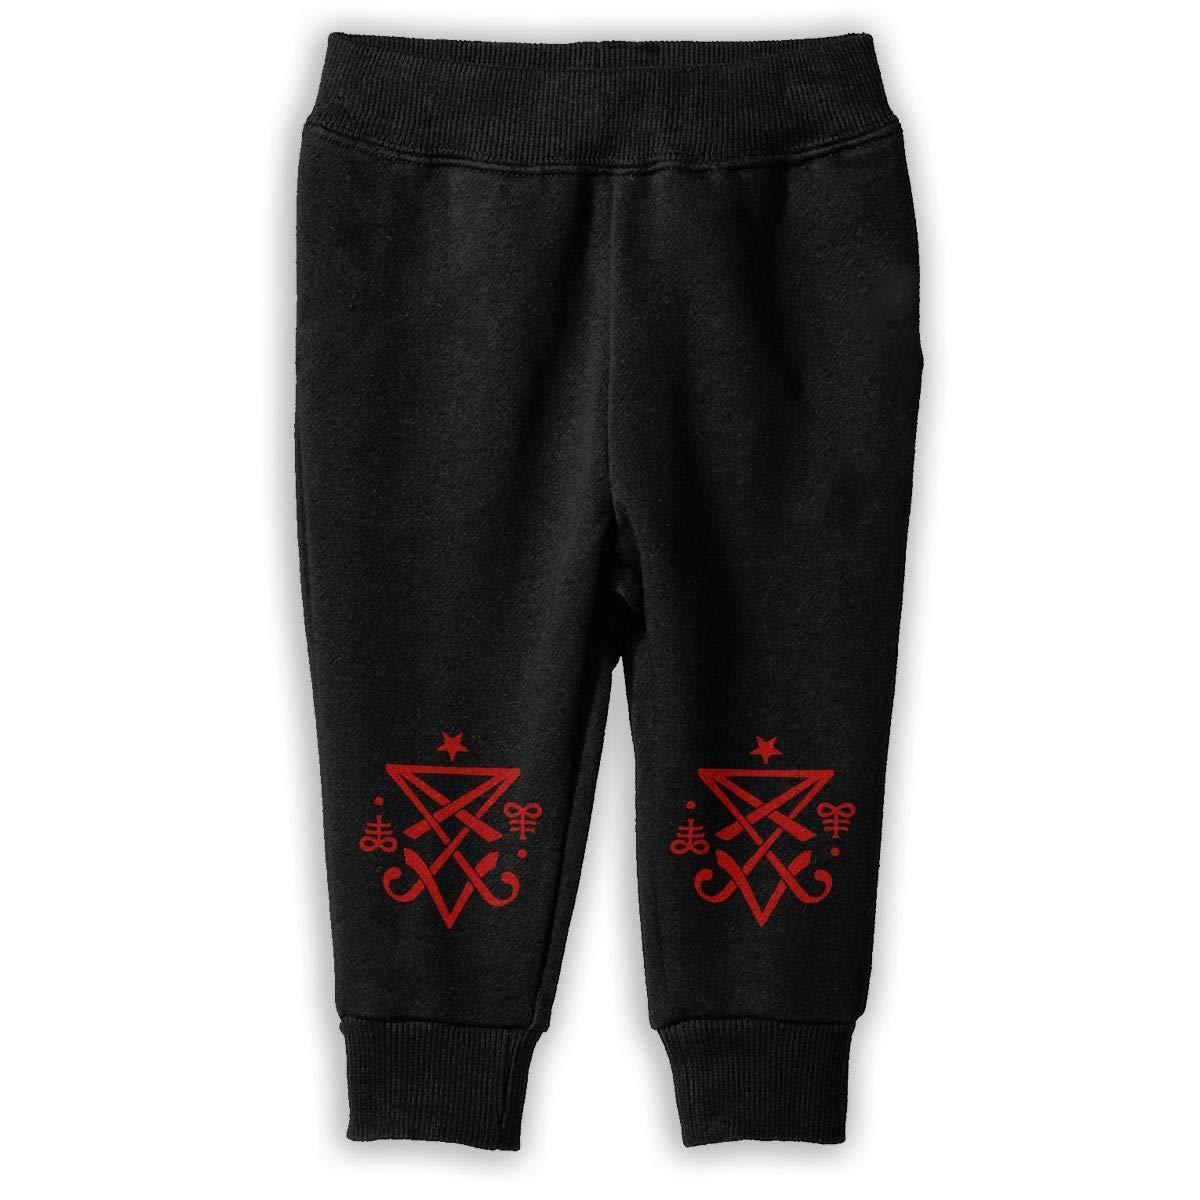 Cool-custom Printed Occult Sigil of Lucifer Satanic Child Boys Girls Unisex Fashion Sweatpants